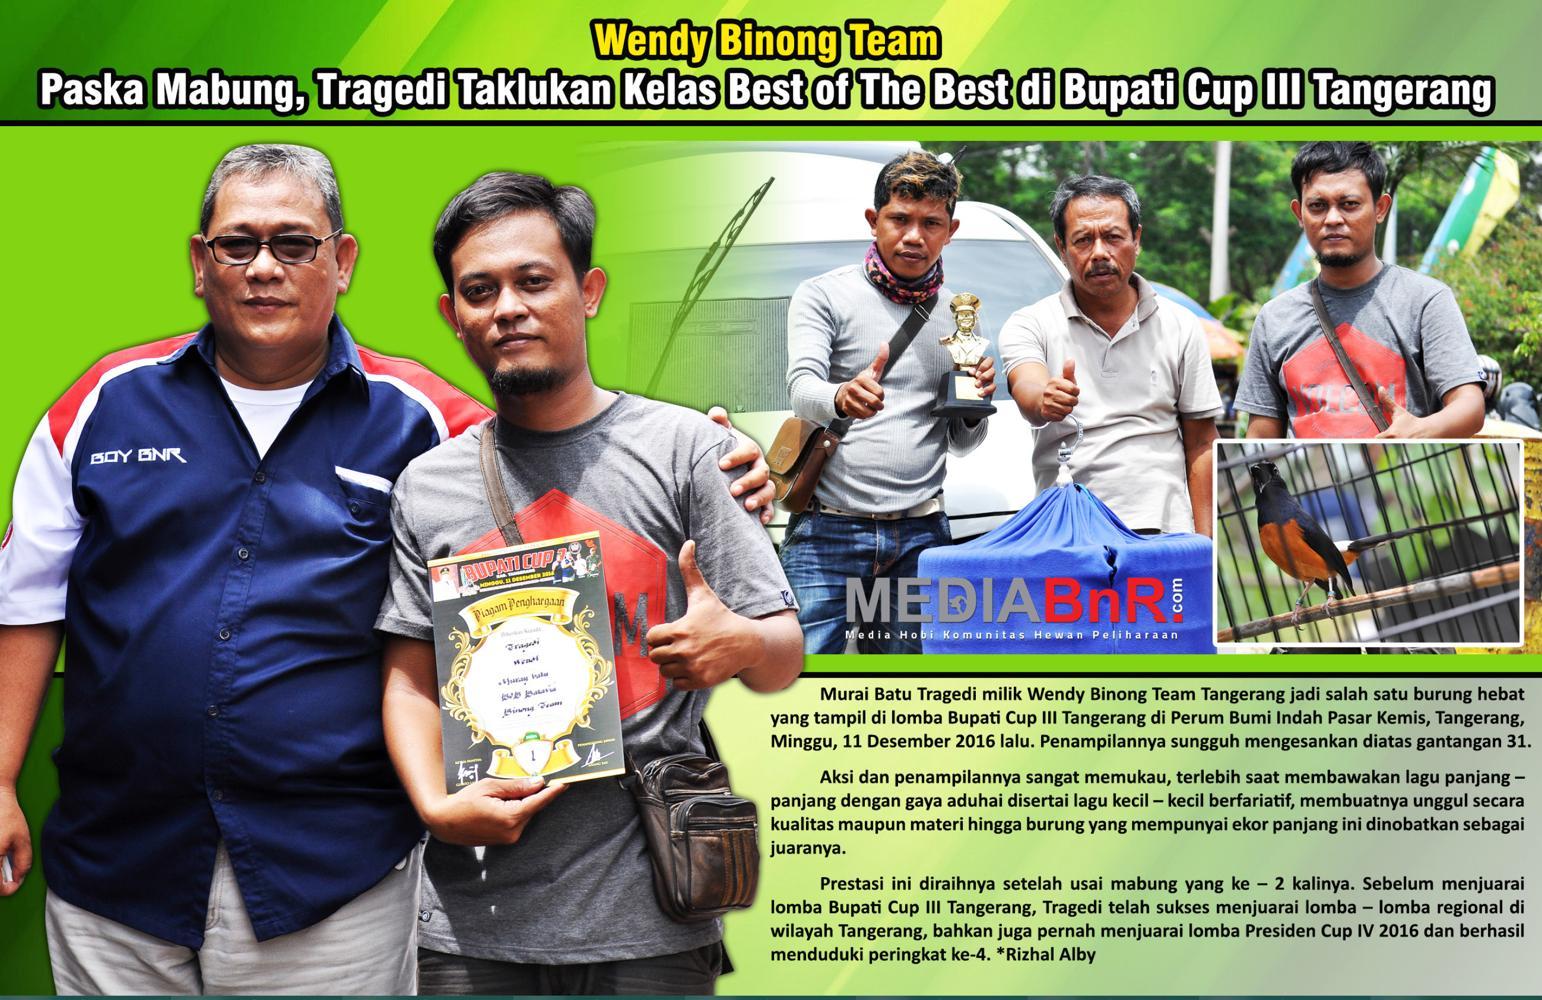 Wendy Binong Team : Pasca Mabung, Tragedi Taklukan Kelas BOB di Bupati Cup 3 Tangerang